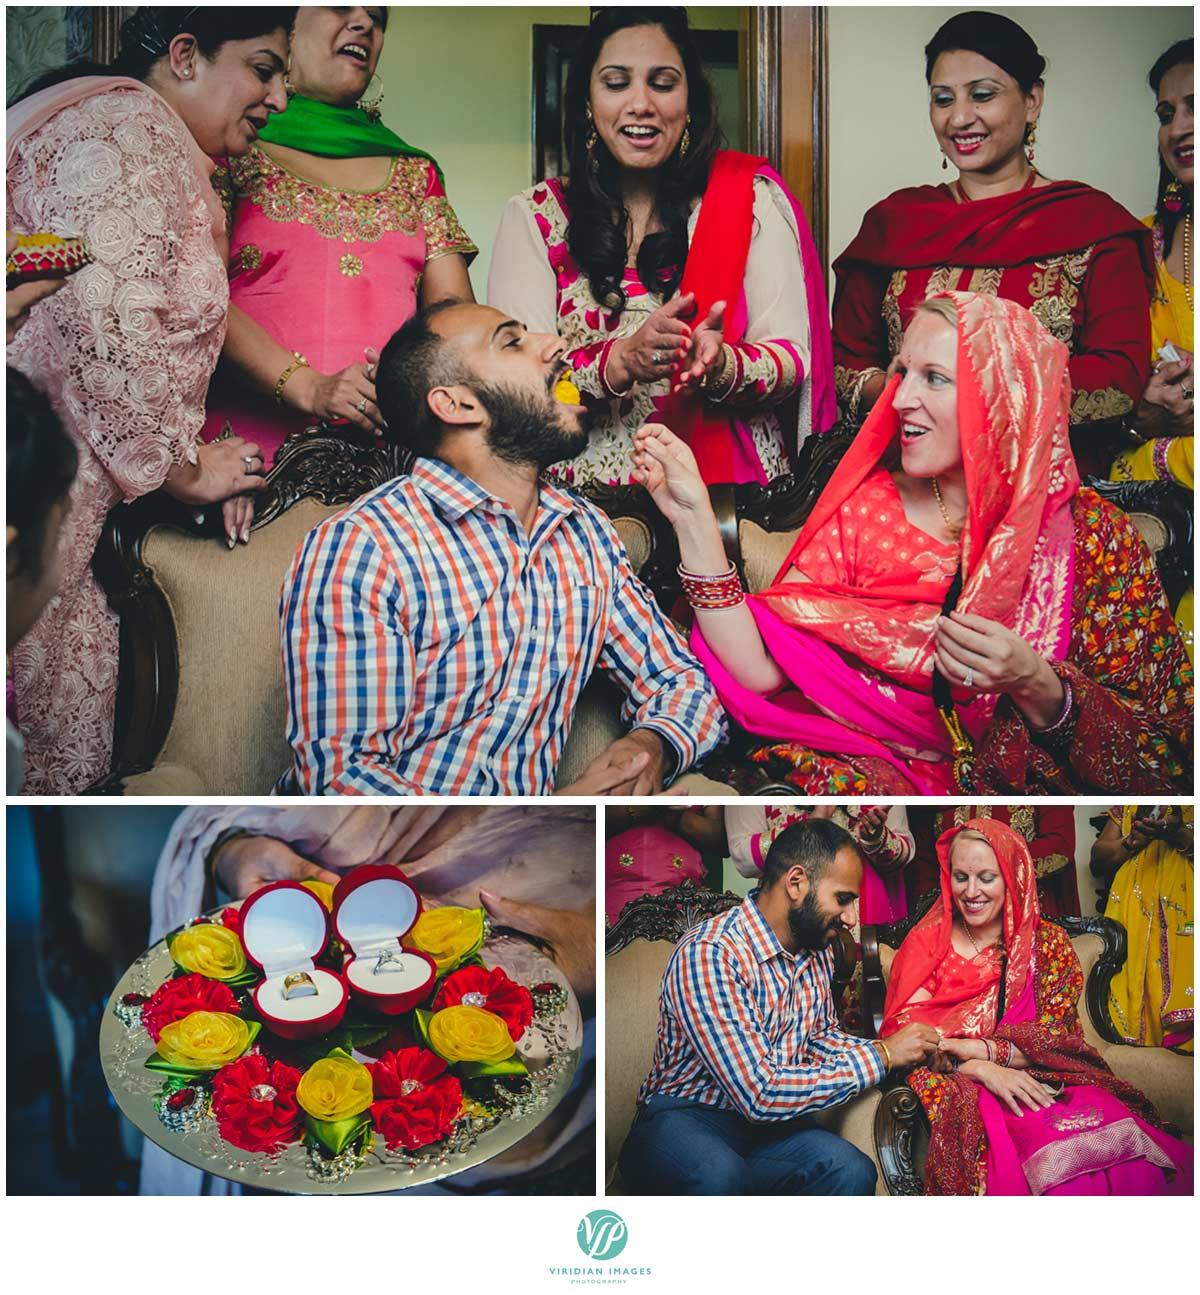 India_Wedding_Chandigarh_Cerenonies_Viridian_Images_Photography_photo_6